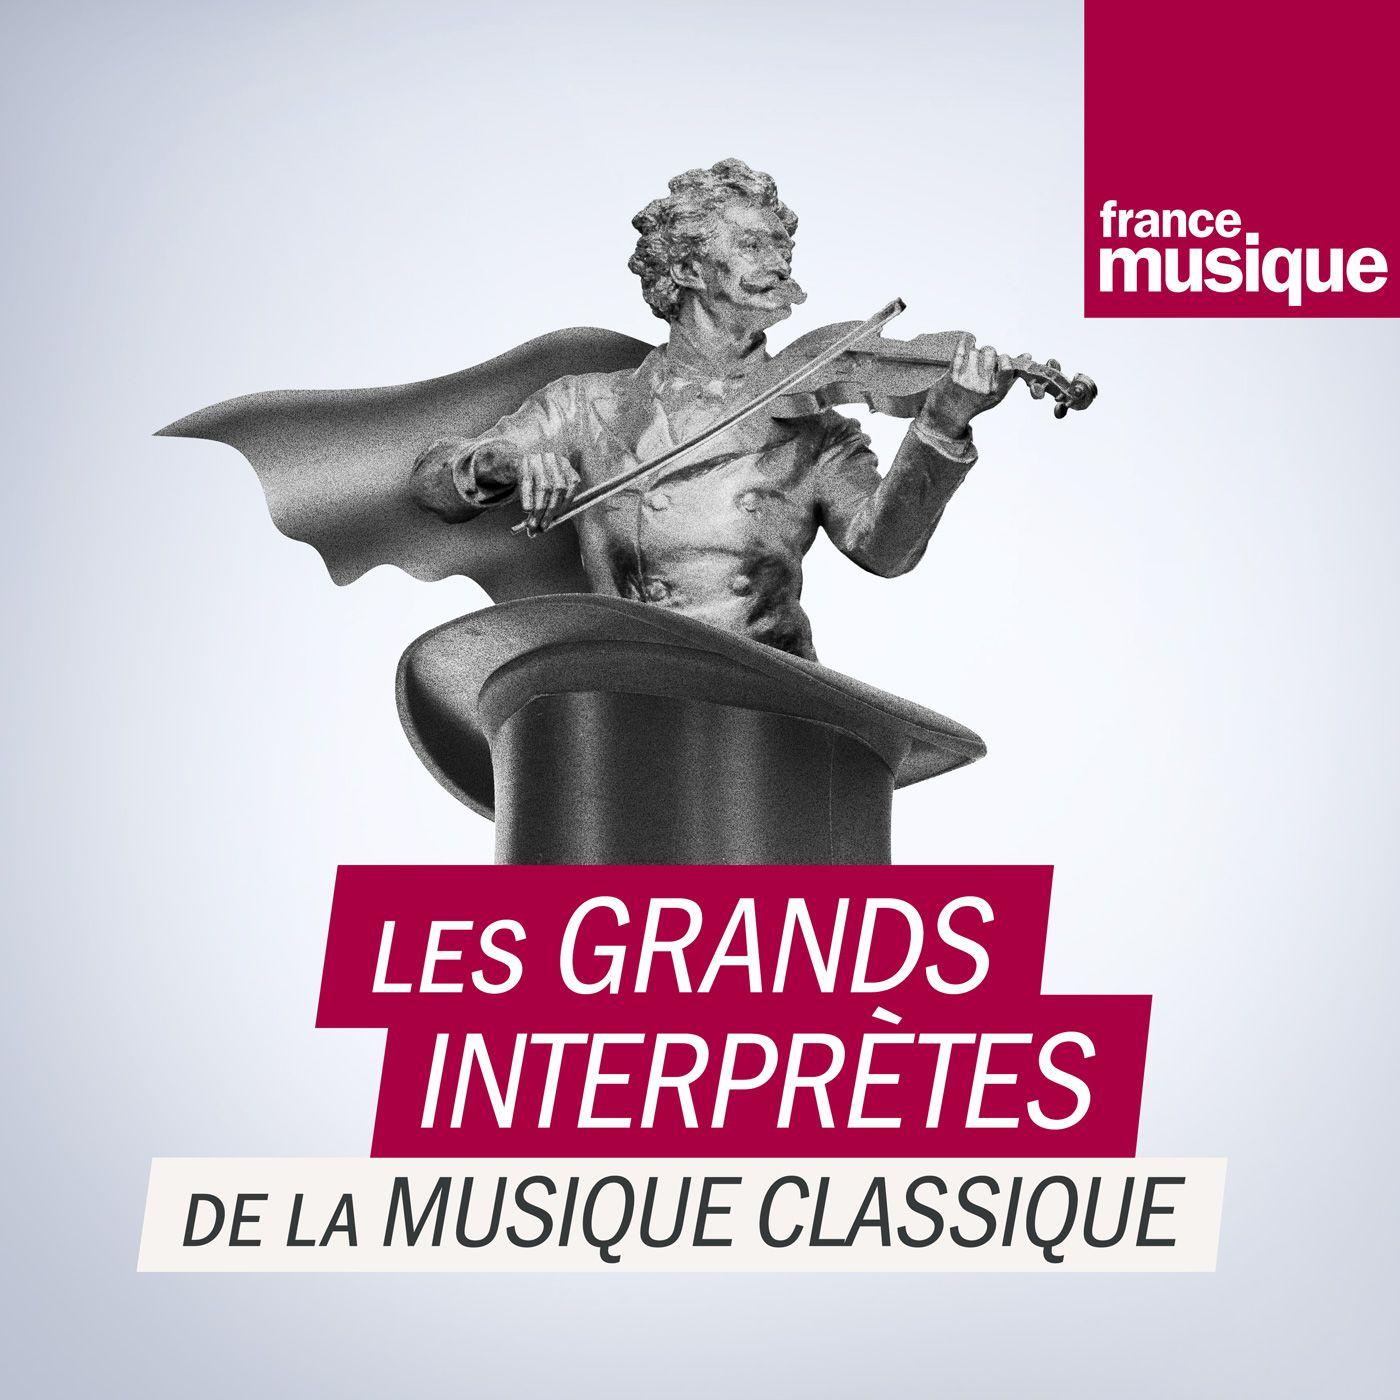 Image 1: Les grands interpretes de la musique classique